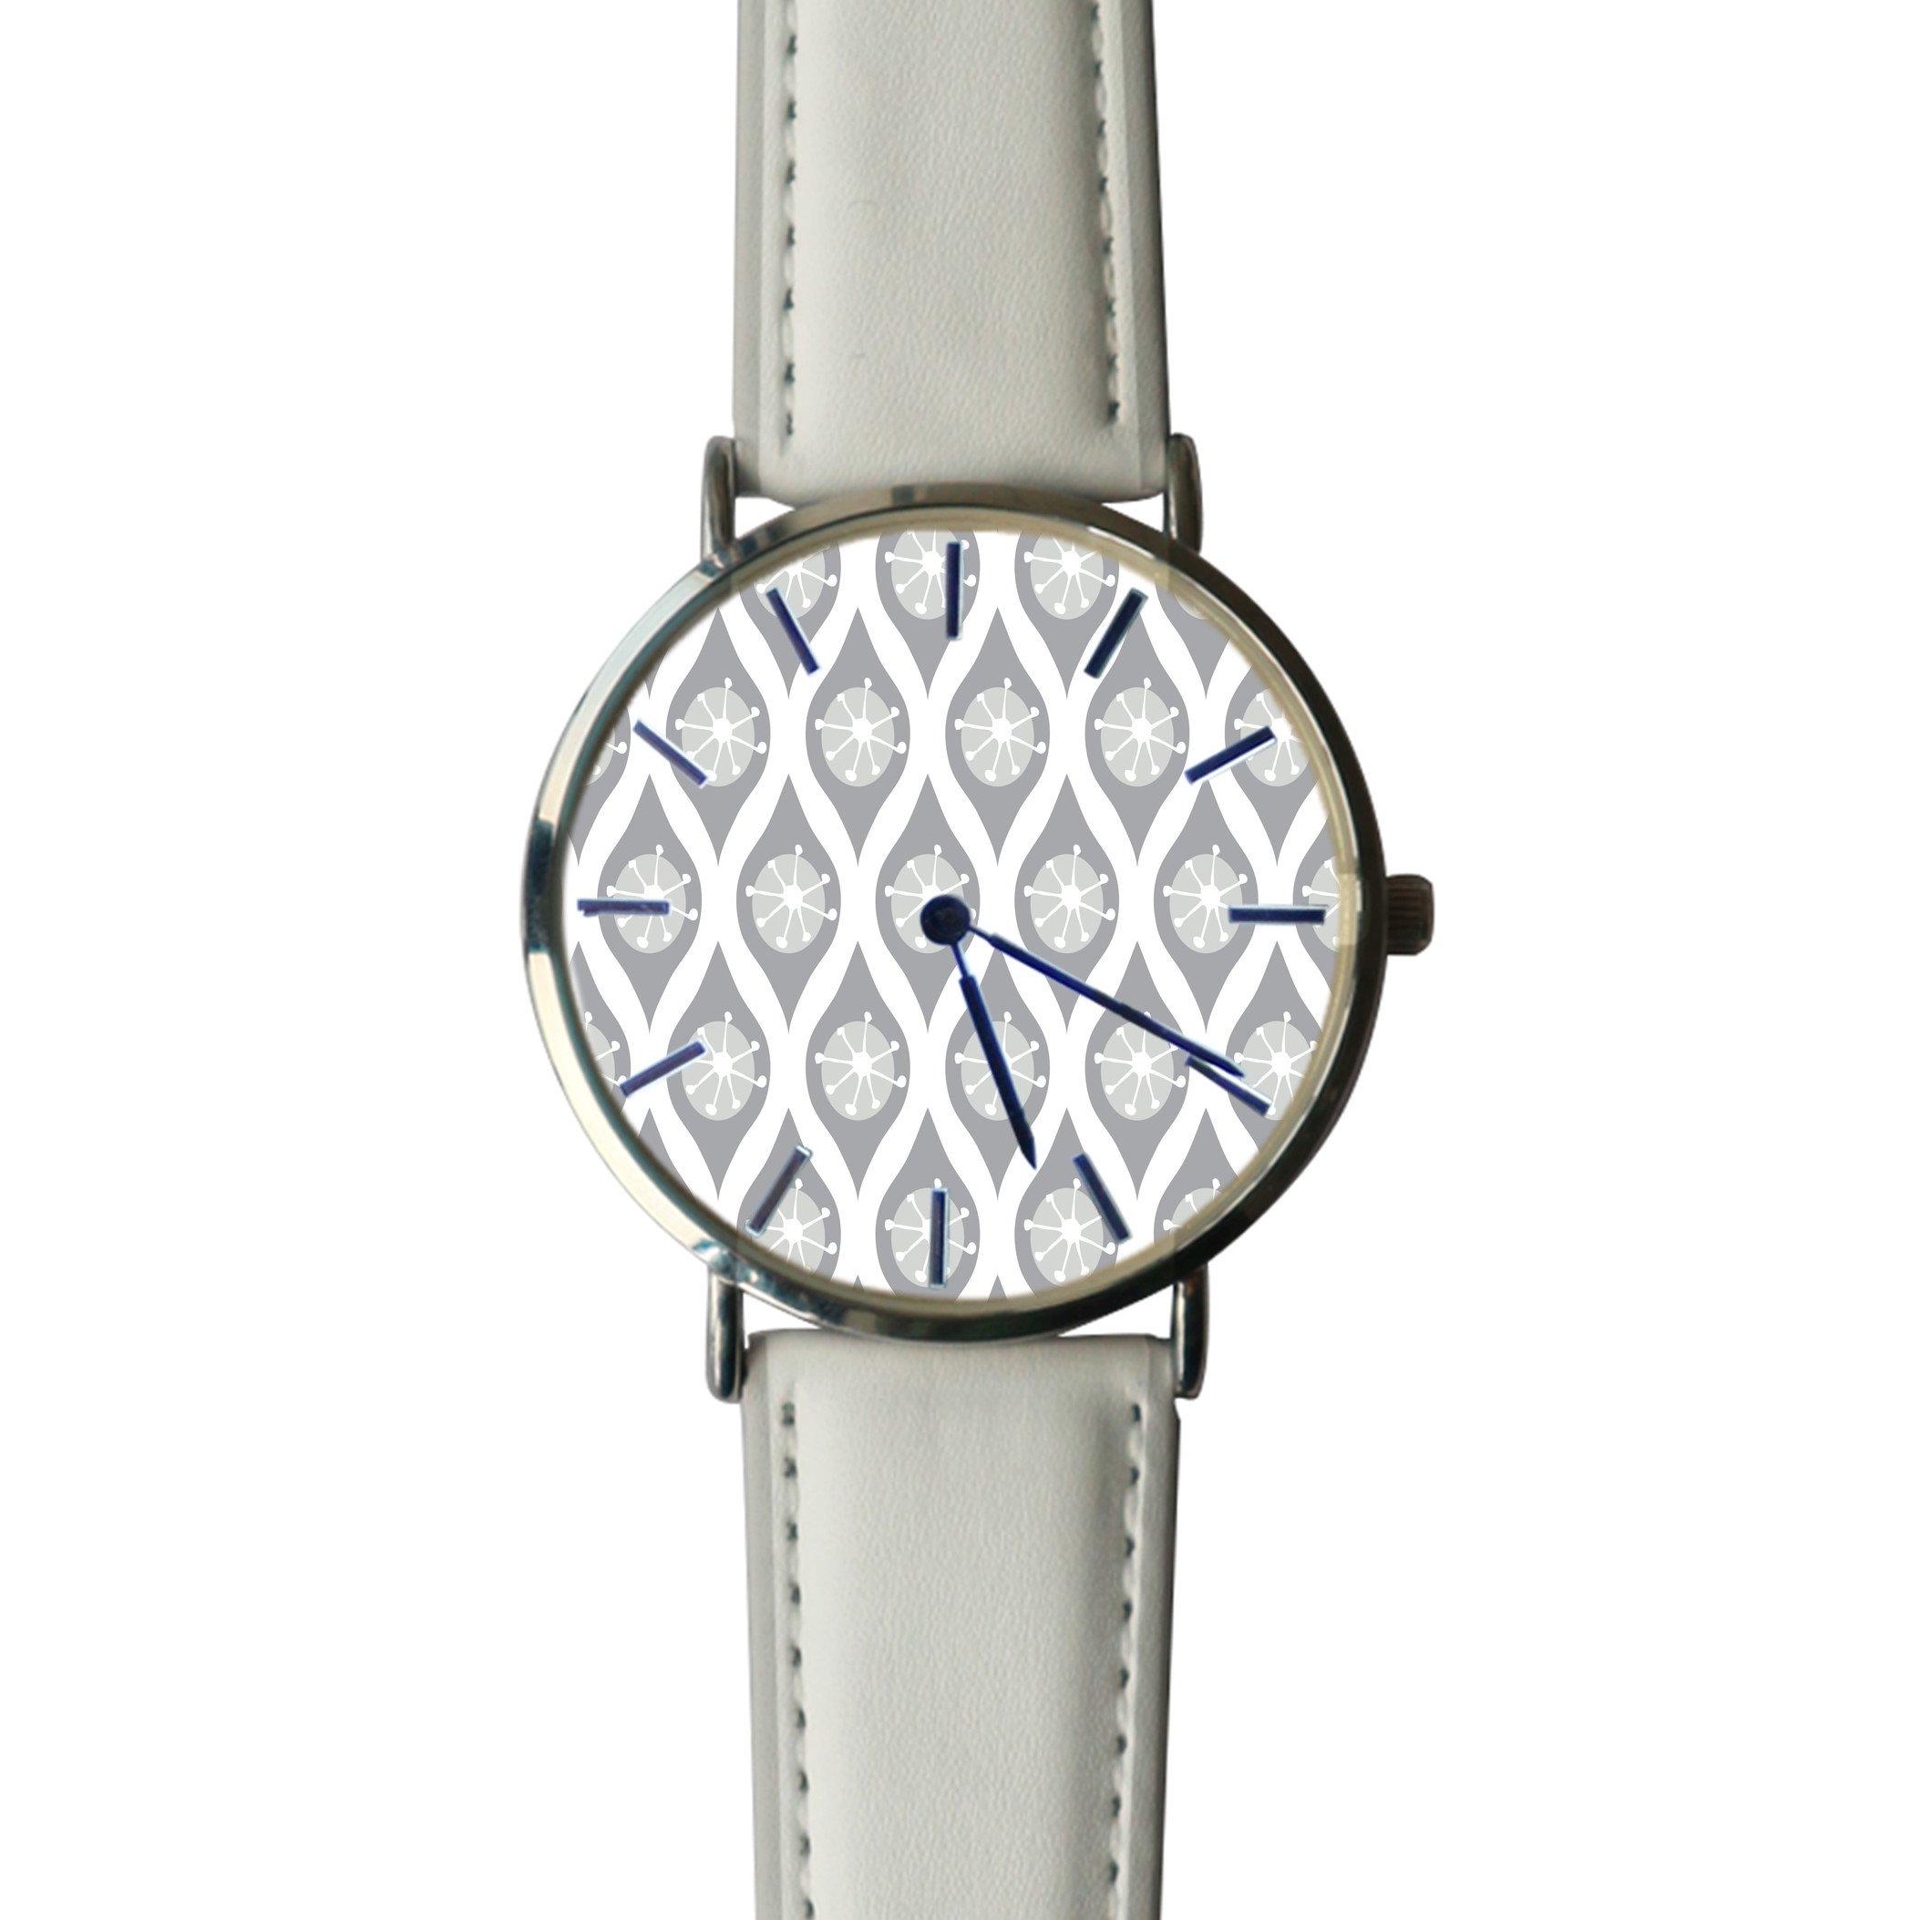 JISJJCKJSX Gray White Mod custom watches quartz watch stainless steel case